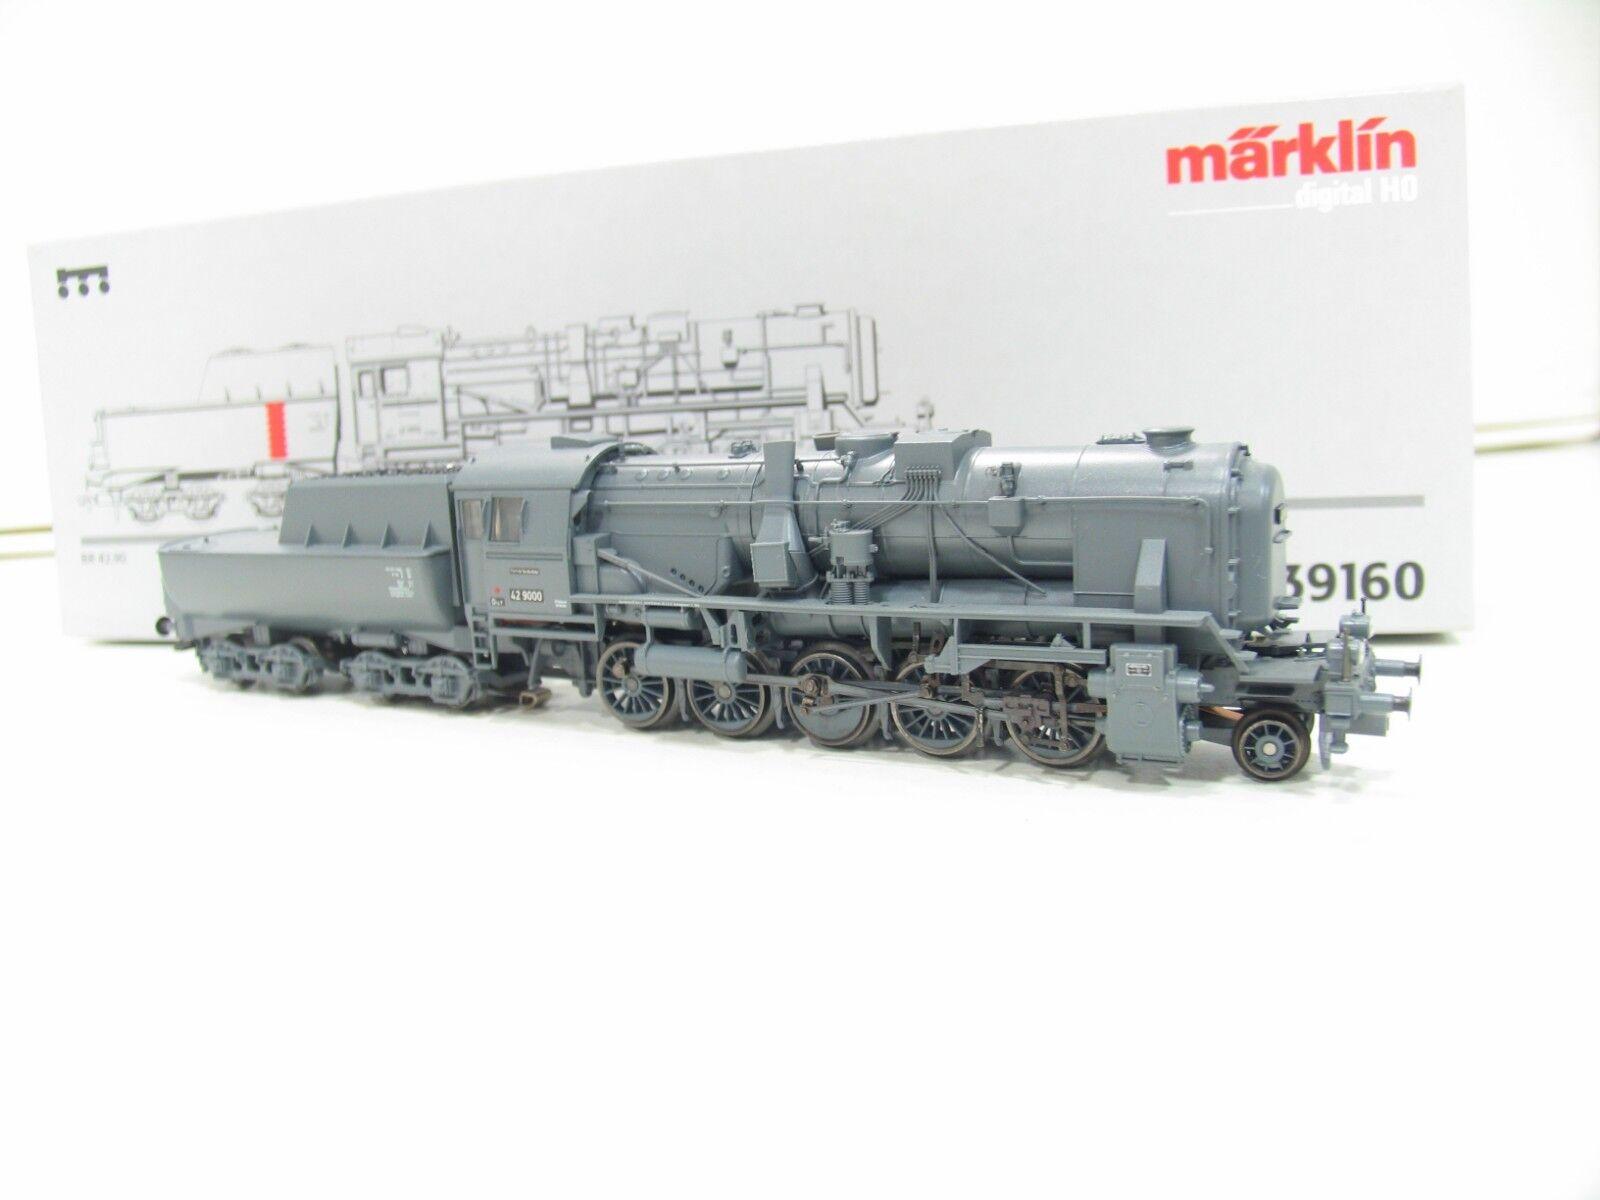 39160 locomotiva BR 42.90 Franco Crosti grigio delle DB DIGITAL nl335